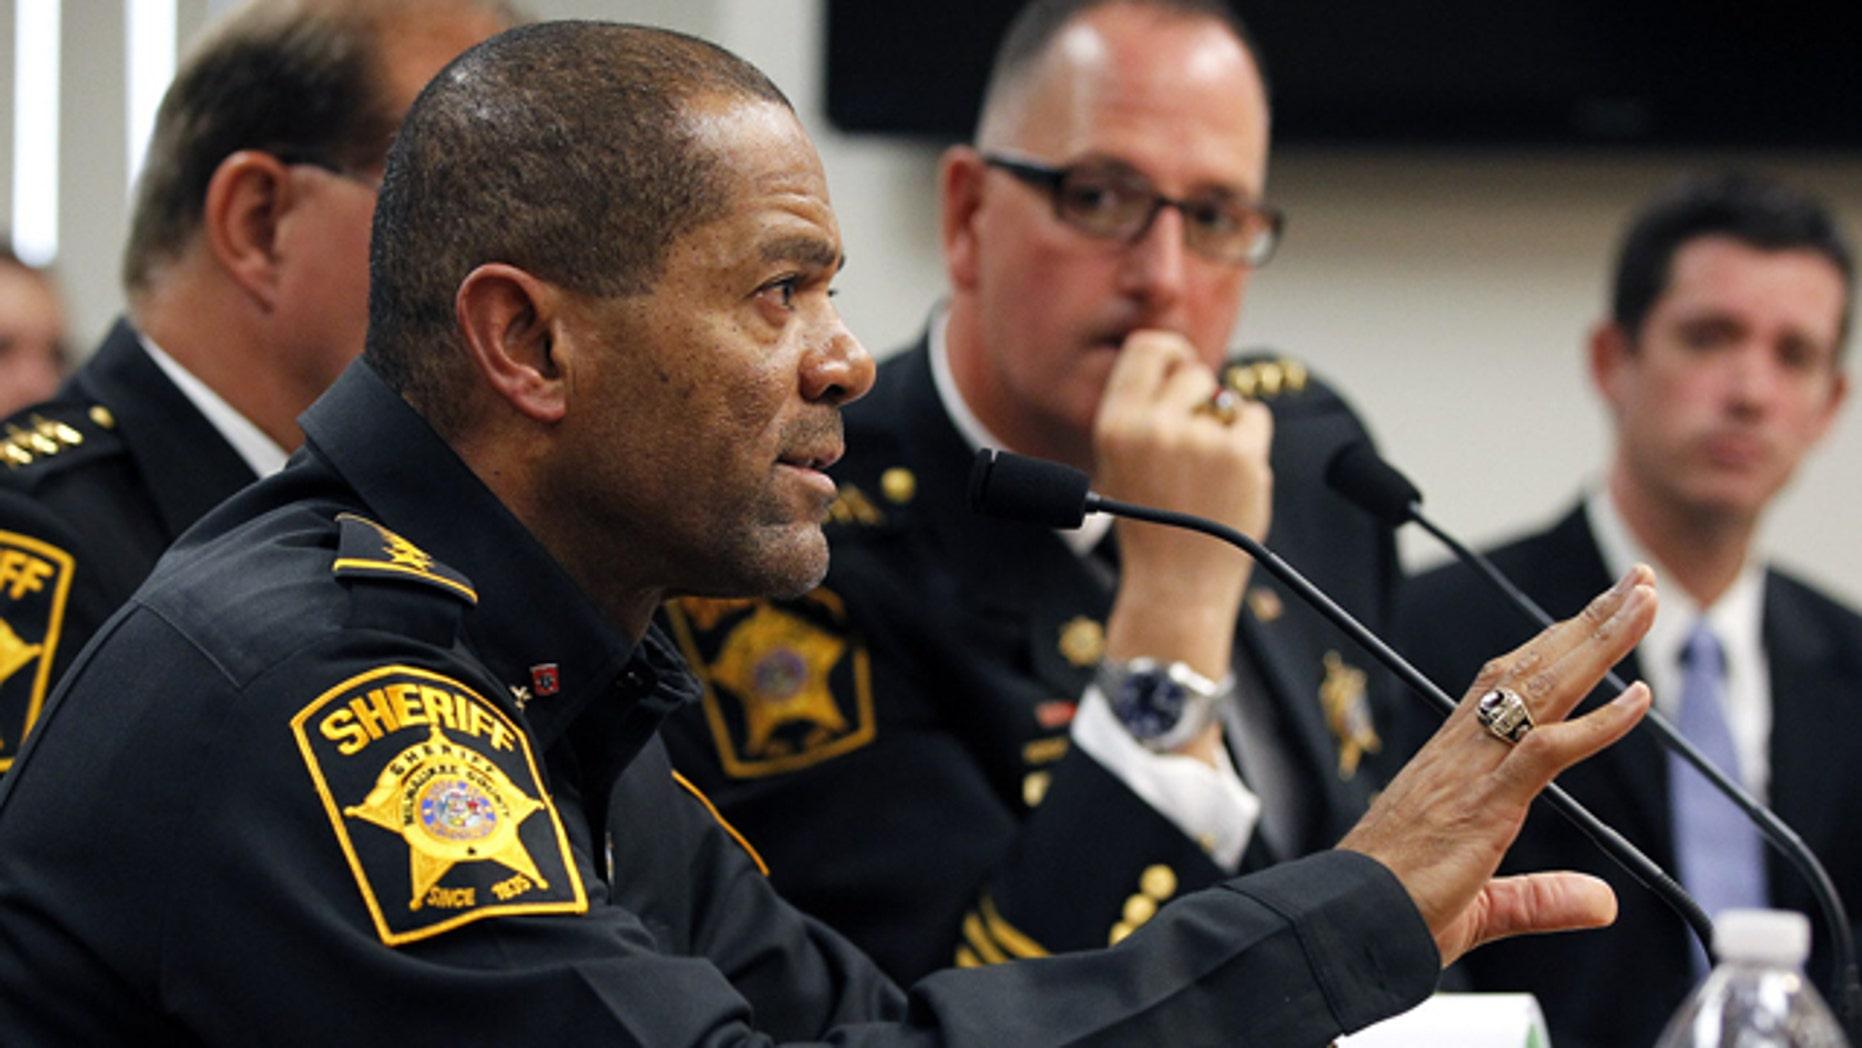 Oct. 11, 2012: Milwaukee County Sheriff David Clarke talks during a budget hearing in Milwaukee, Wis.